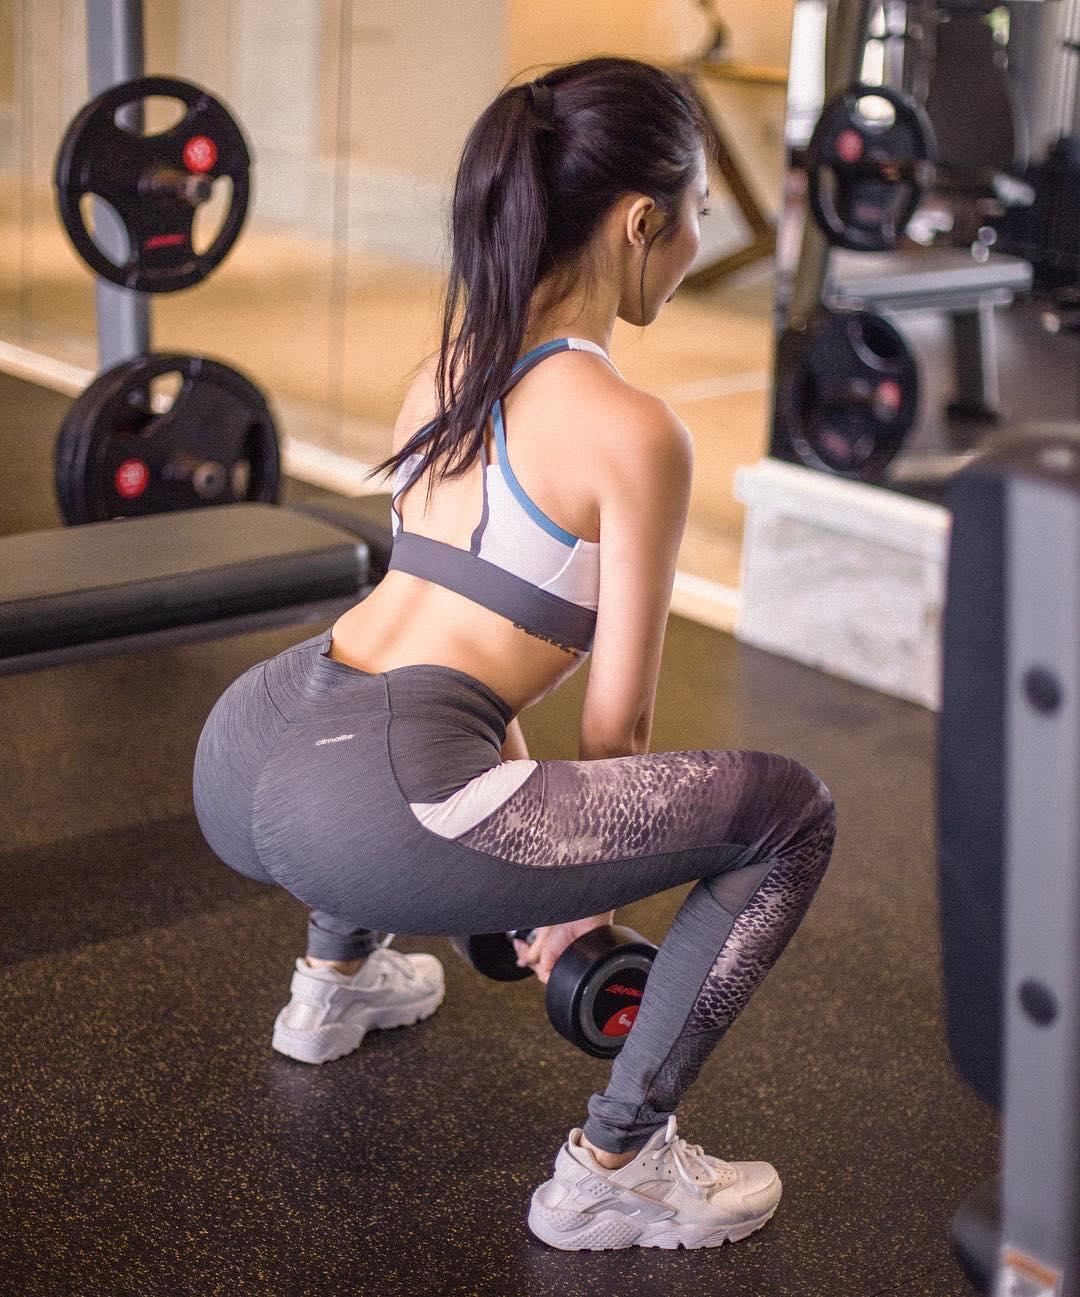 2-ban-co-dang-mac-phai-5-sai-lam-nay-khi-tap-the-duc-voi-dong-tac-squat